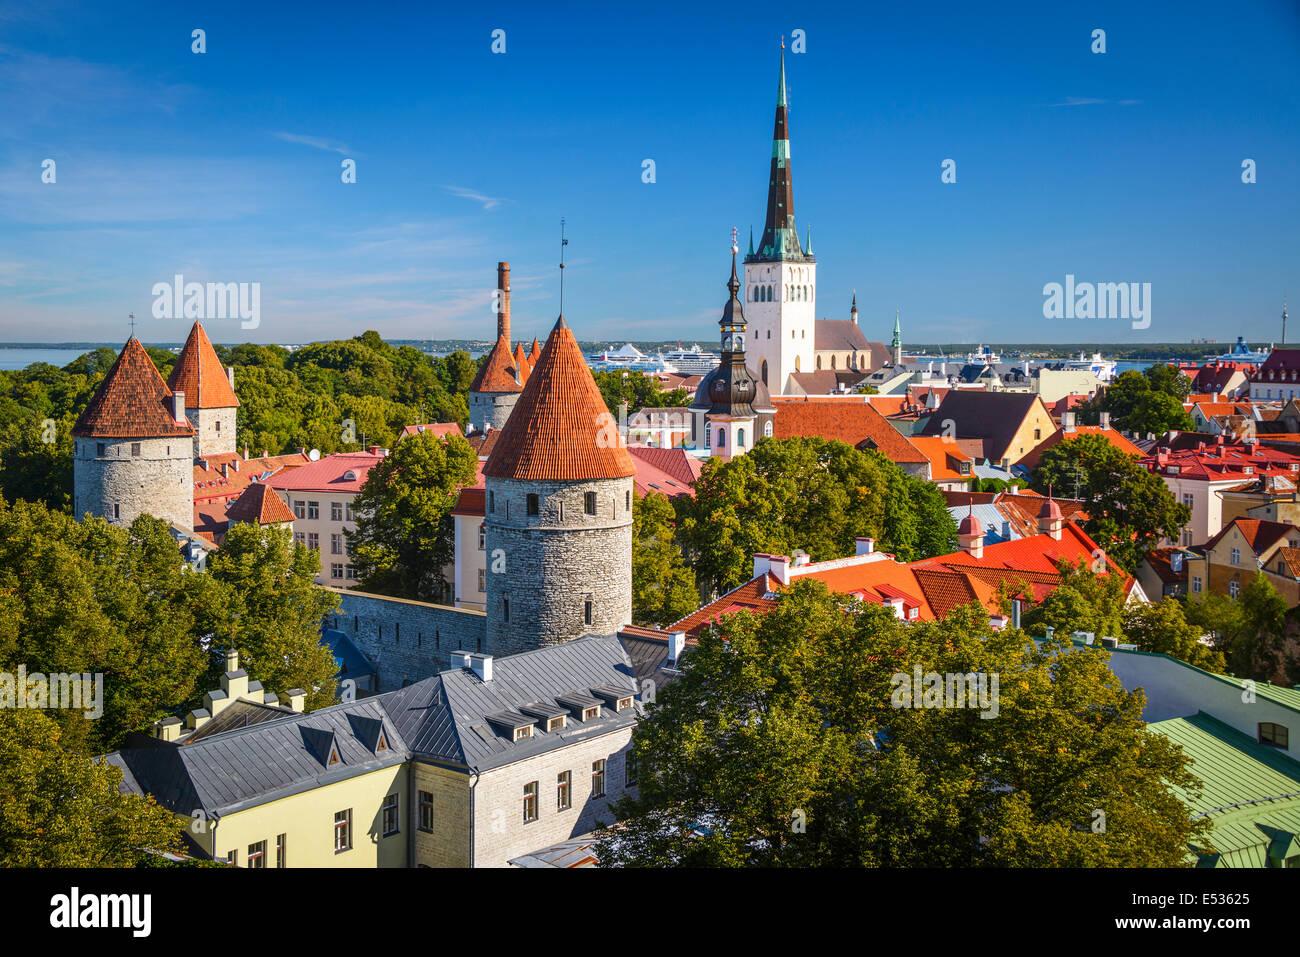 Tallinn, Estland alte Skyline der Stadt. Stockbild